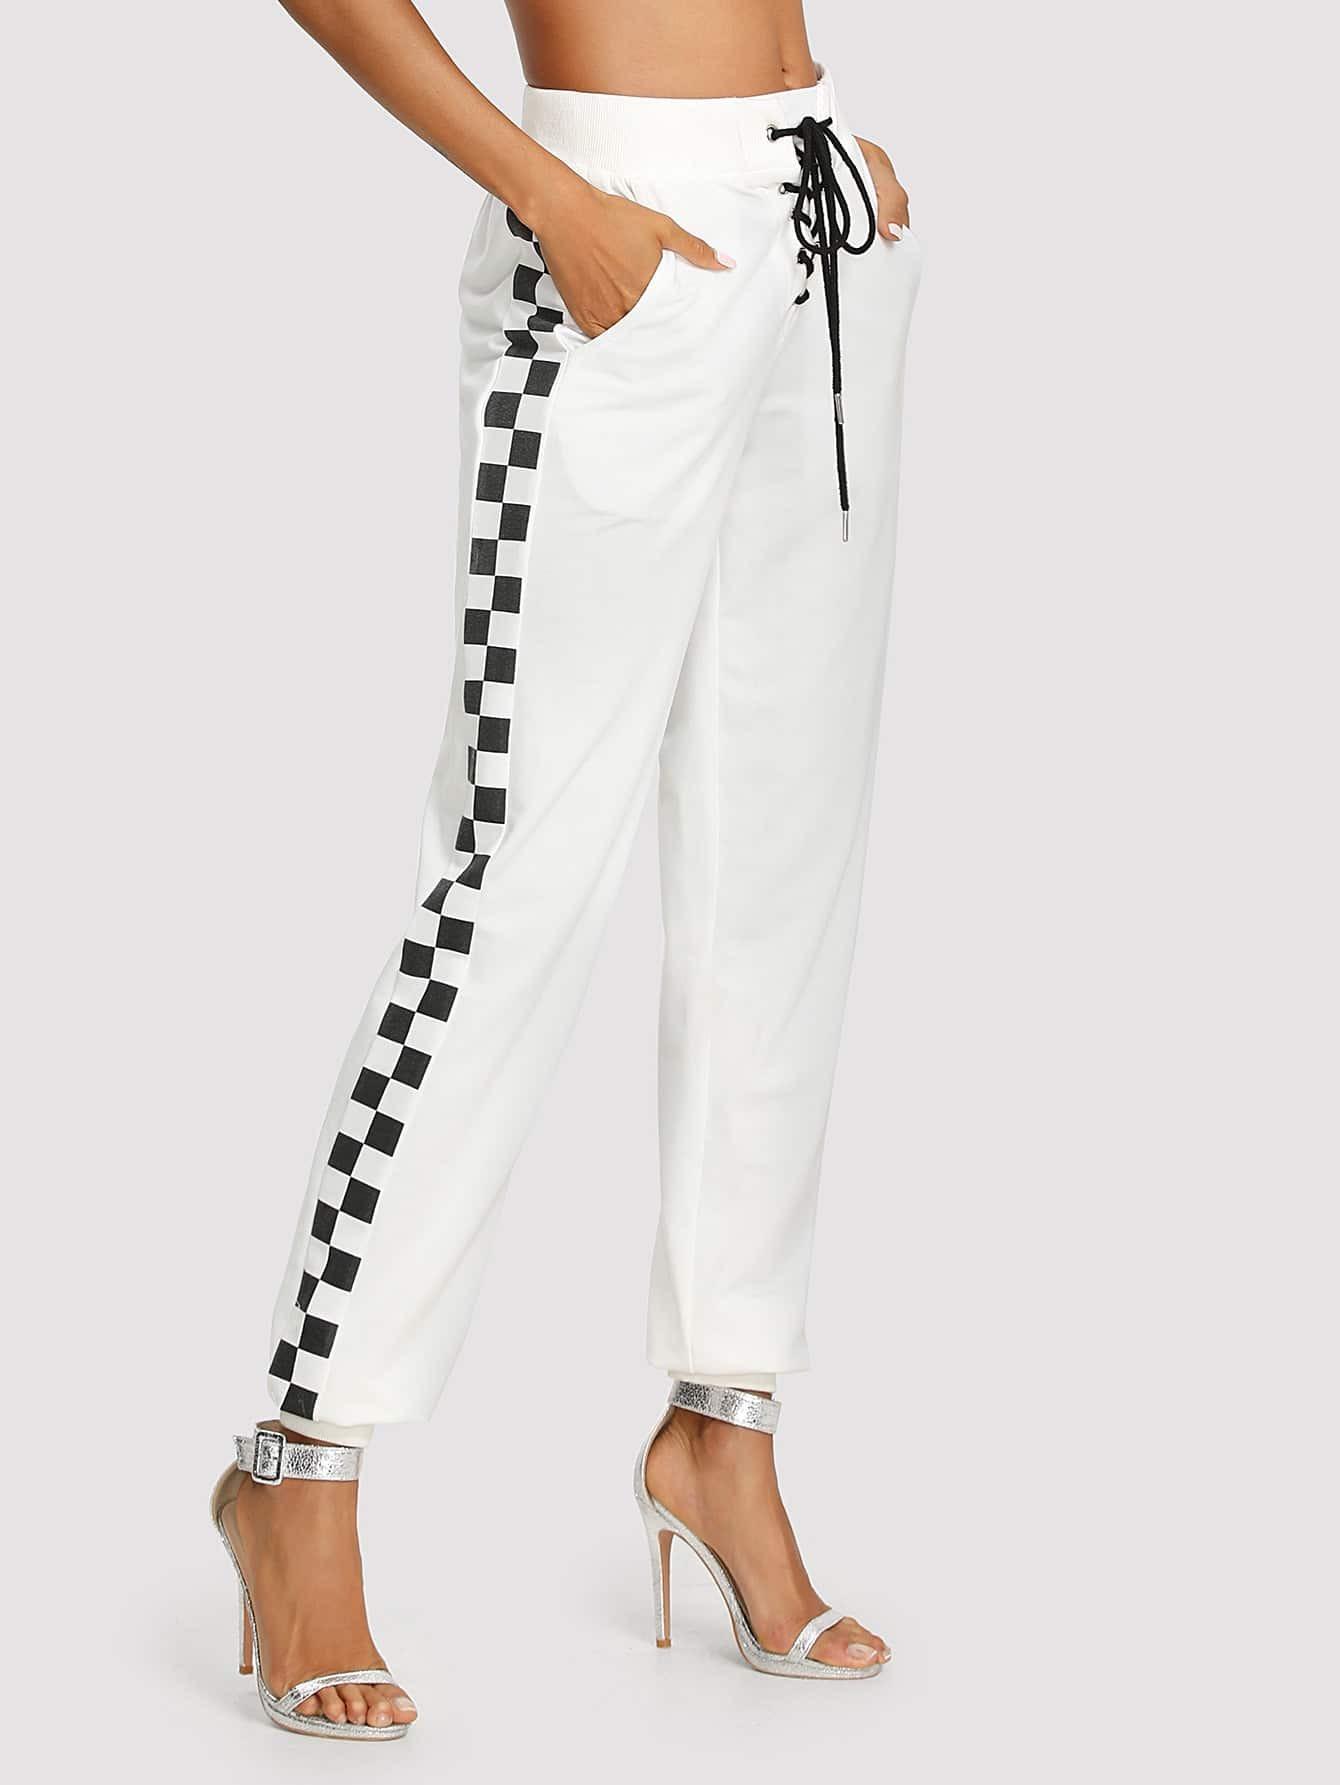 Side Plaid Print Lace Up Front Pants пуховики puma пуховик style 480 hd down jacket